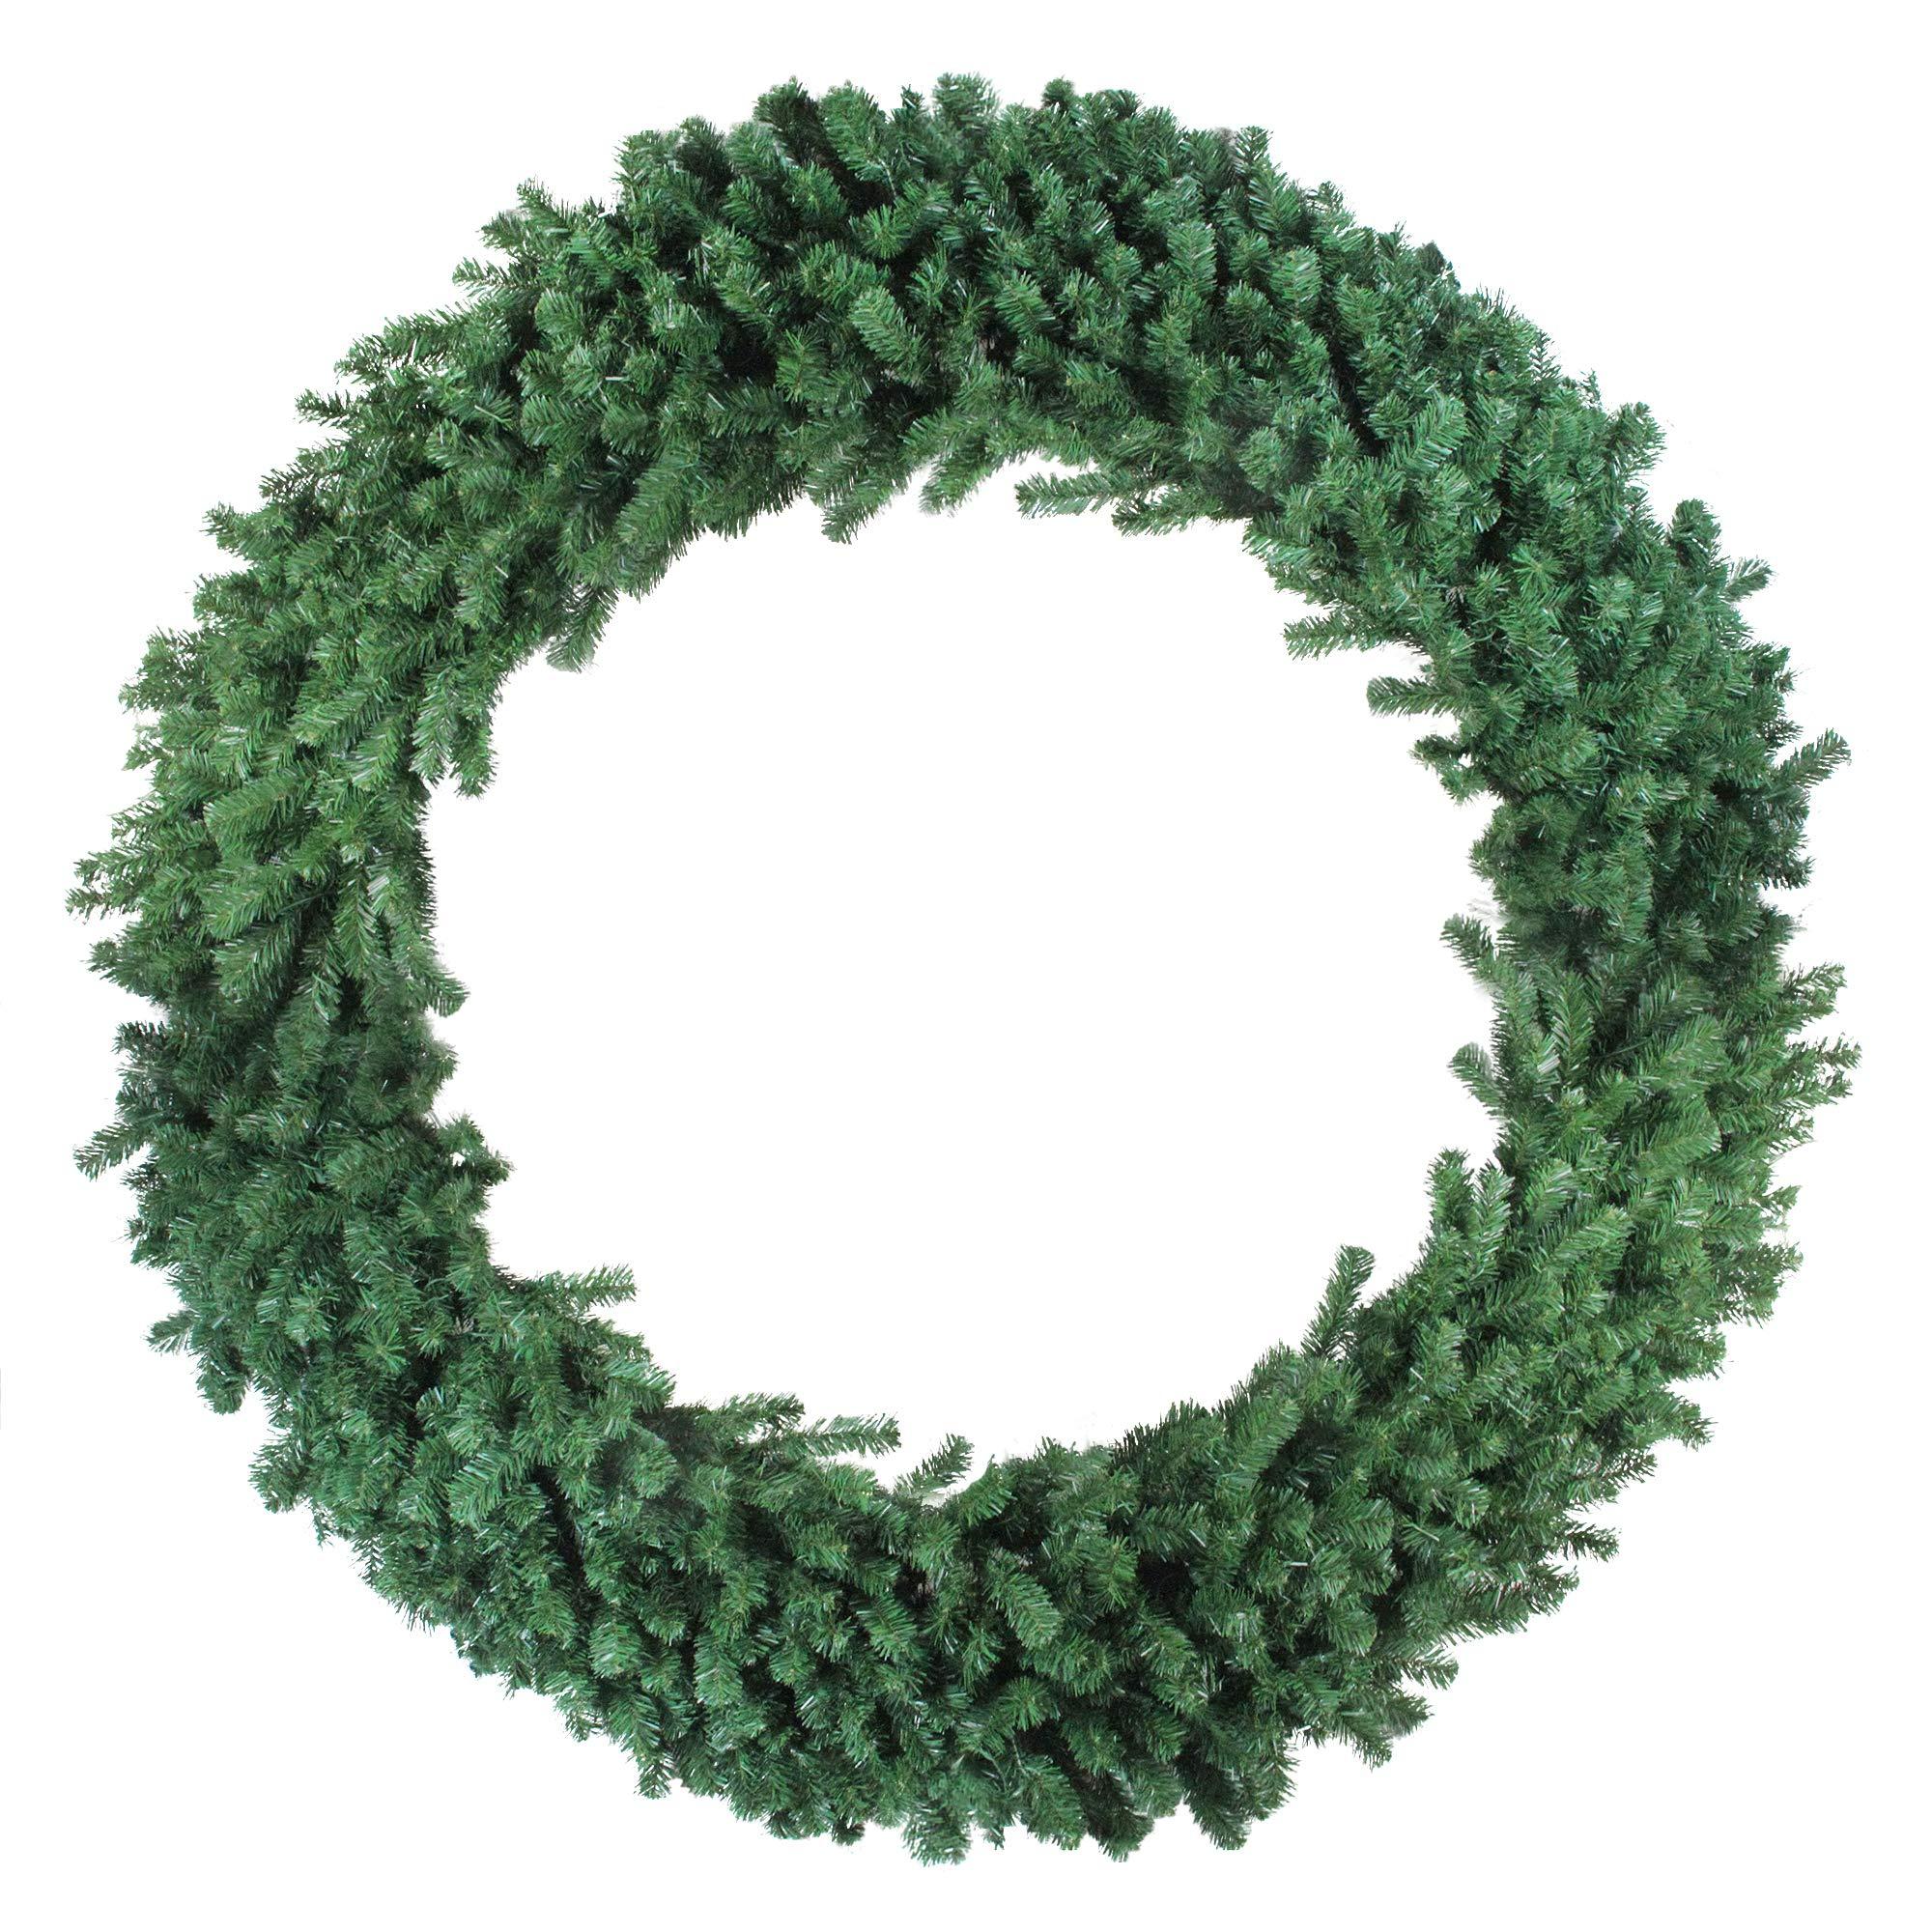 Northlight Deluxe Windsor Pine Artificial Christmas Wreath – 72-inch, Unlit